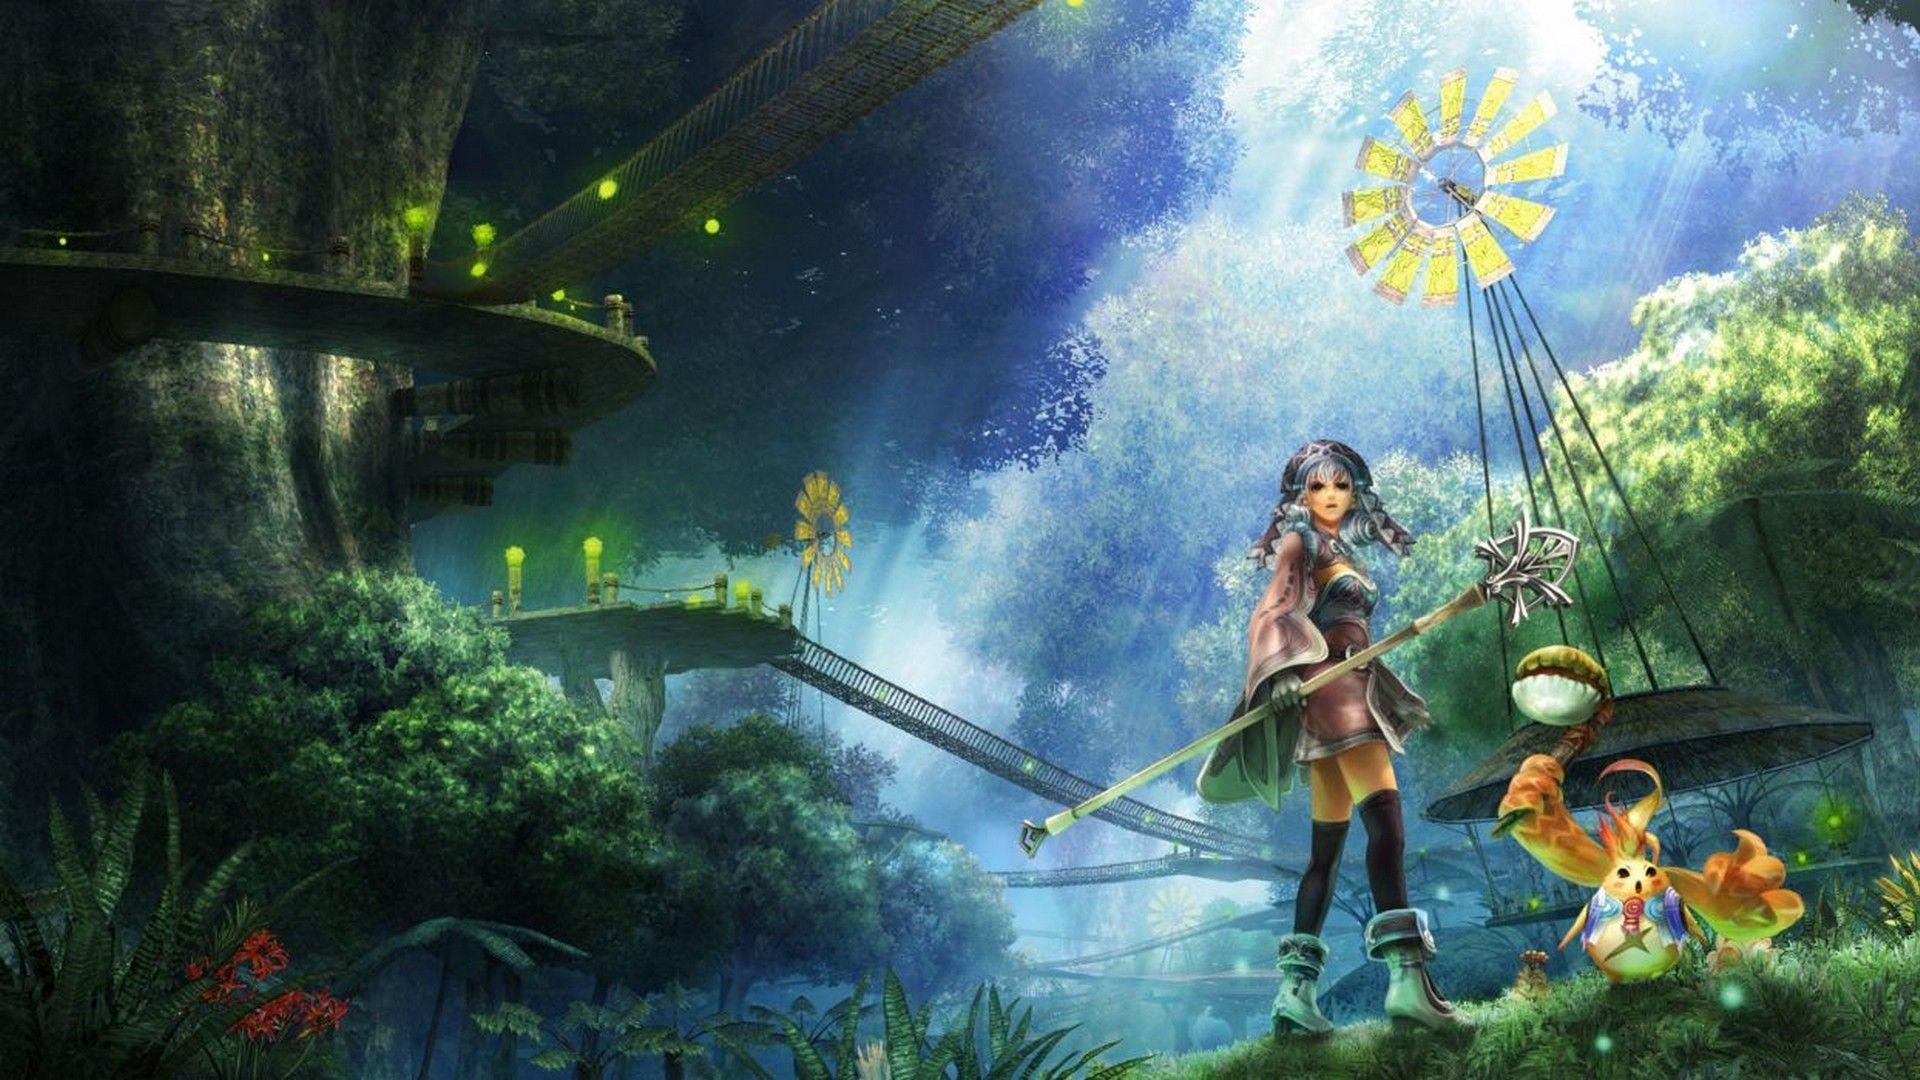 Fantasy Art Hd Wallpaper 2020 Live Wallpaper Hd Anime Background Anime Wallpaper Xenoblade Chronicles